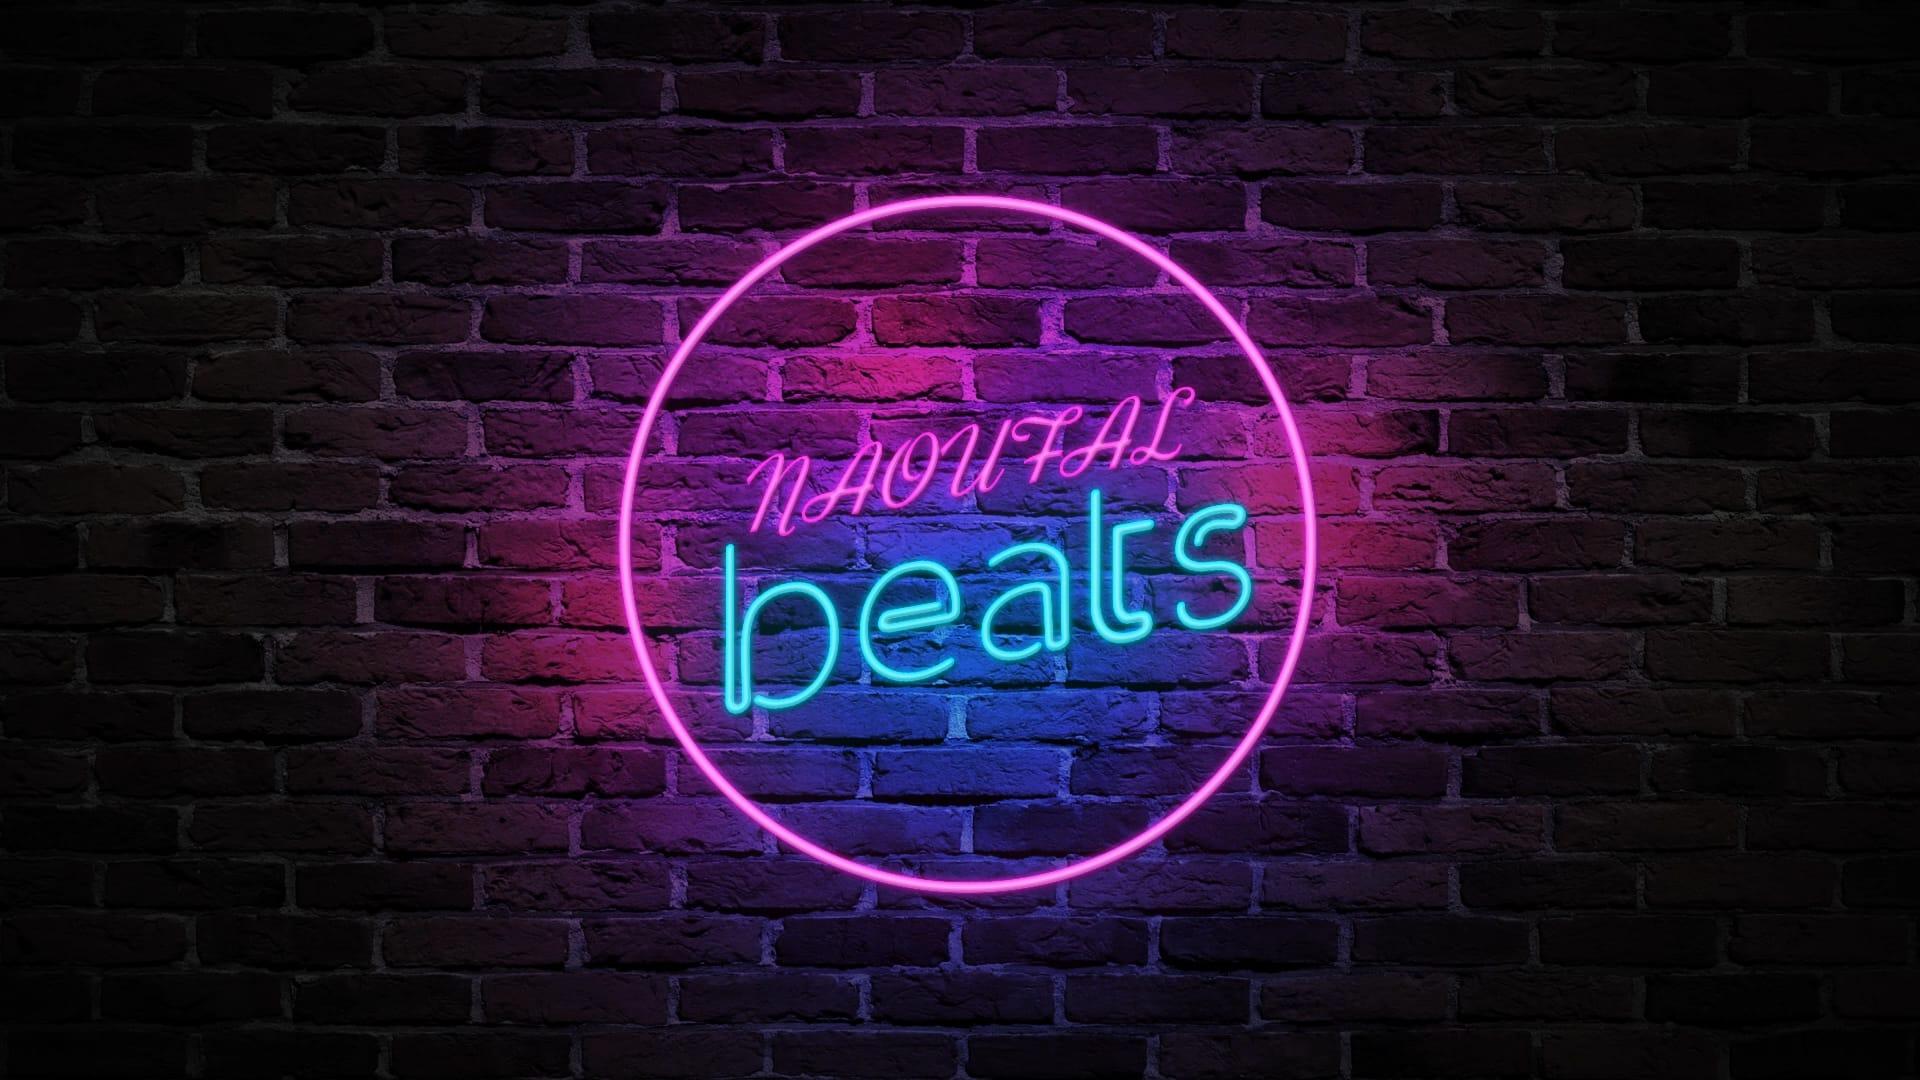 Make A Cool Neon Flicker Animation By Naoufalbeats